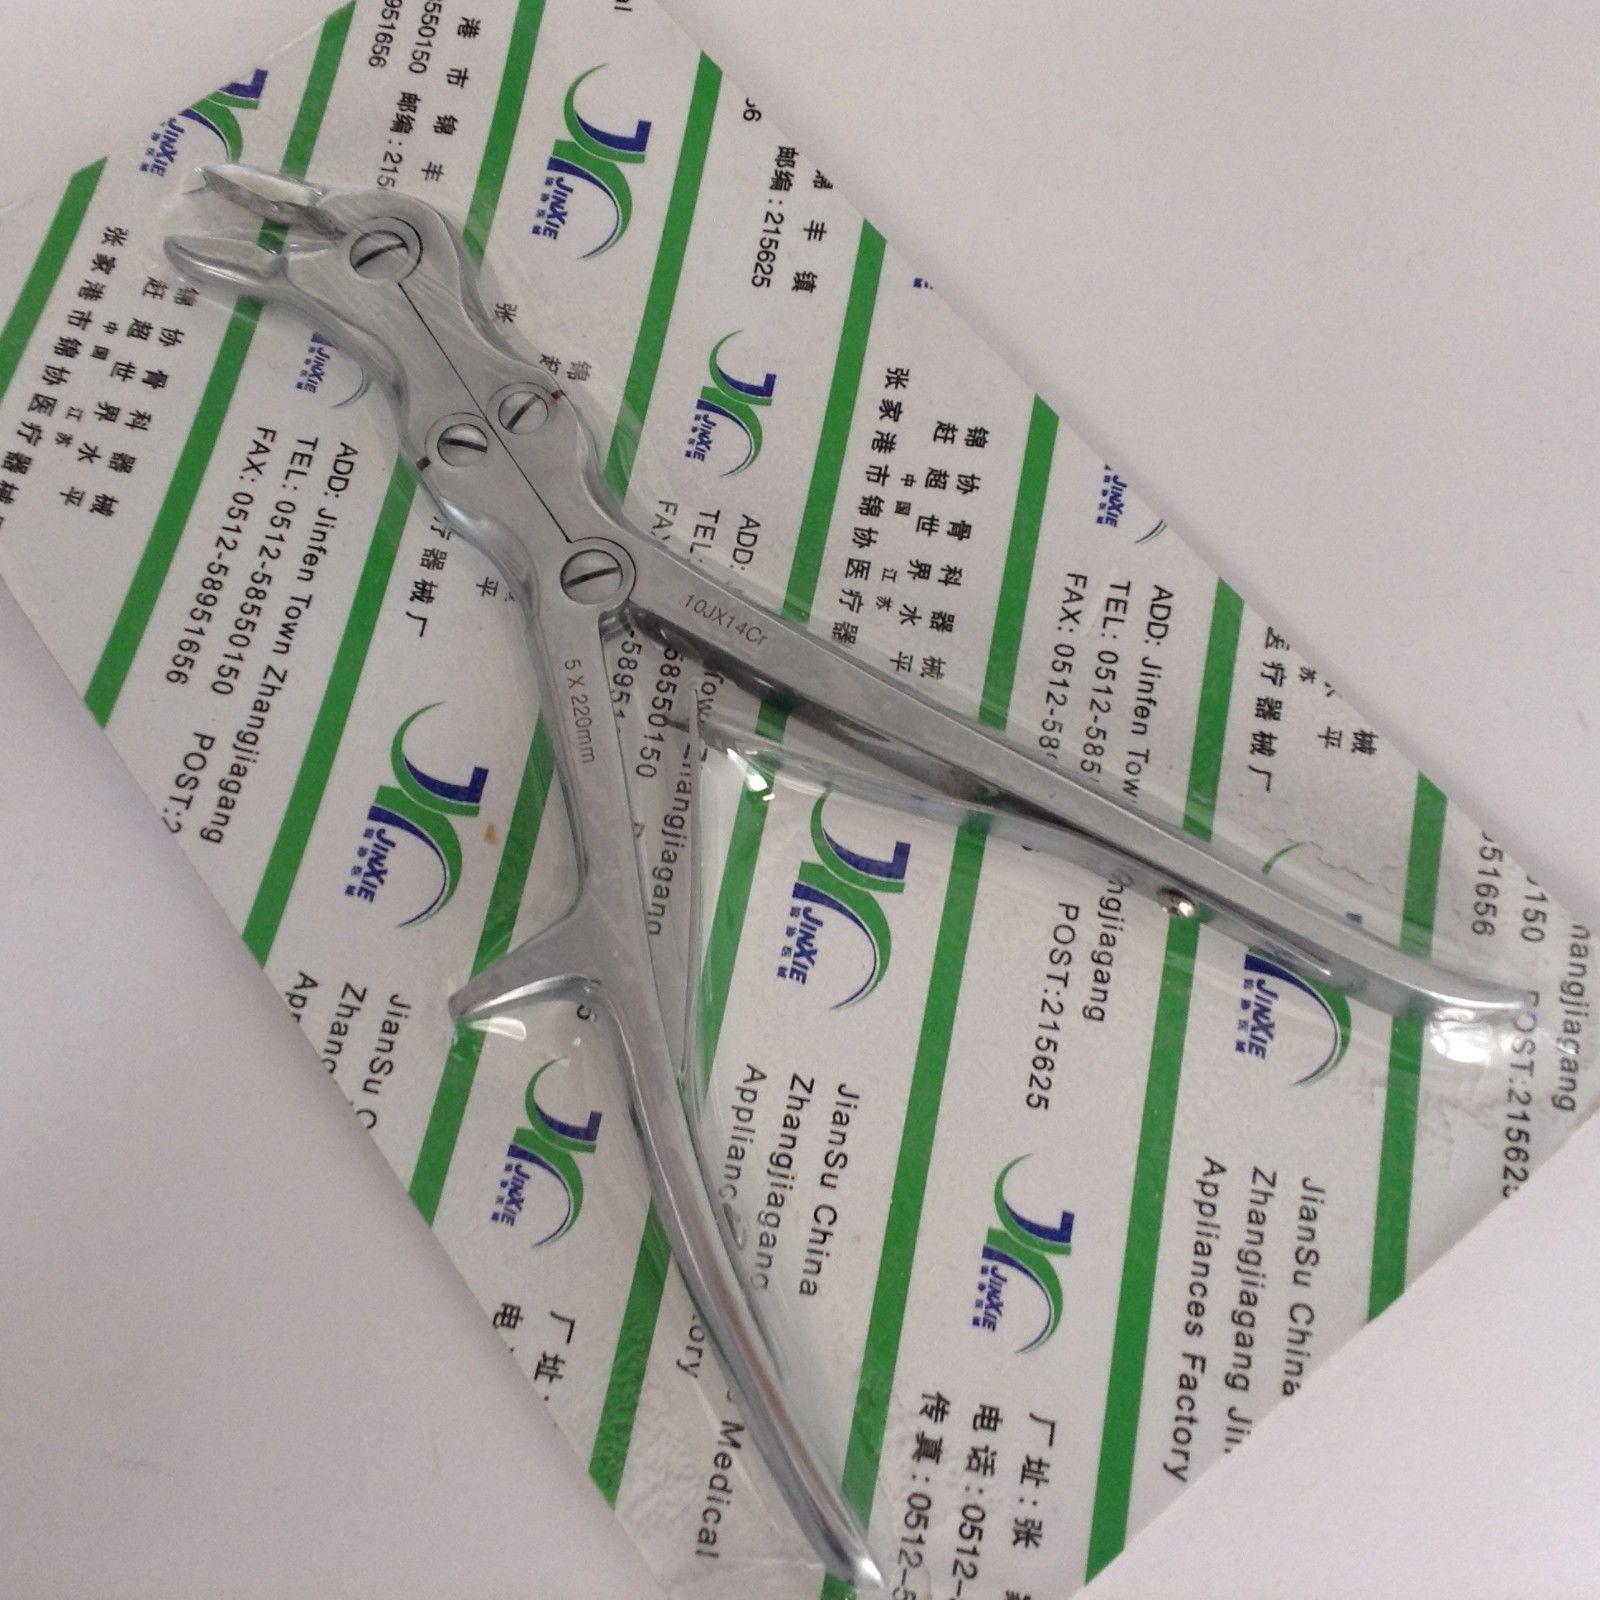 Bone Rongeurs 220m Orthopedics Surgical Instruments